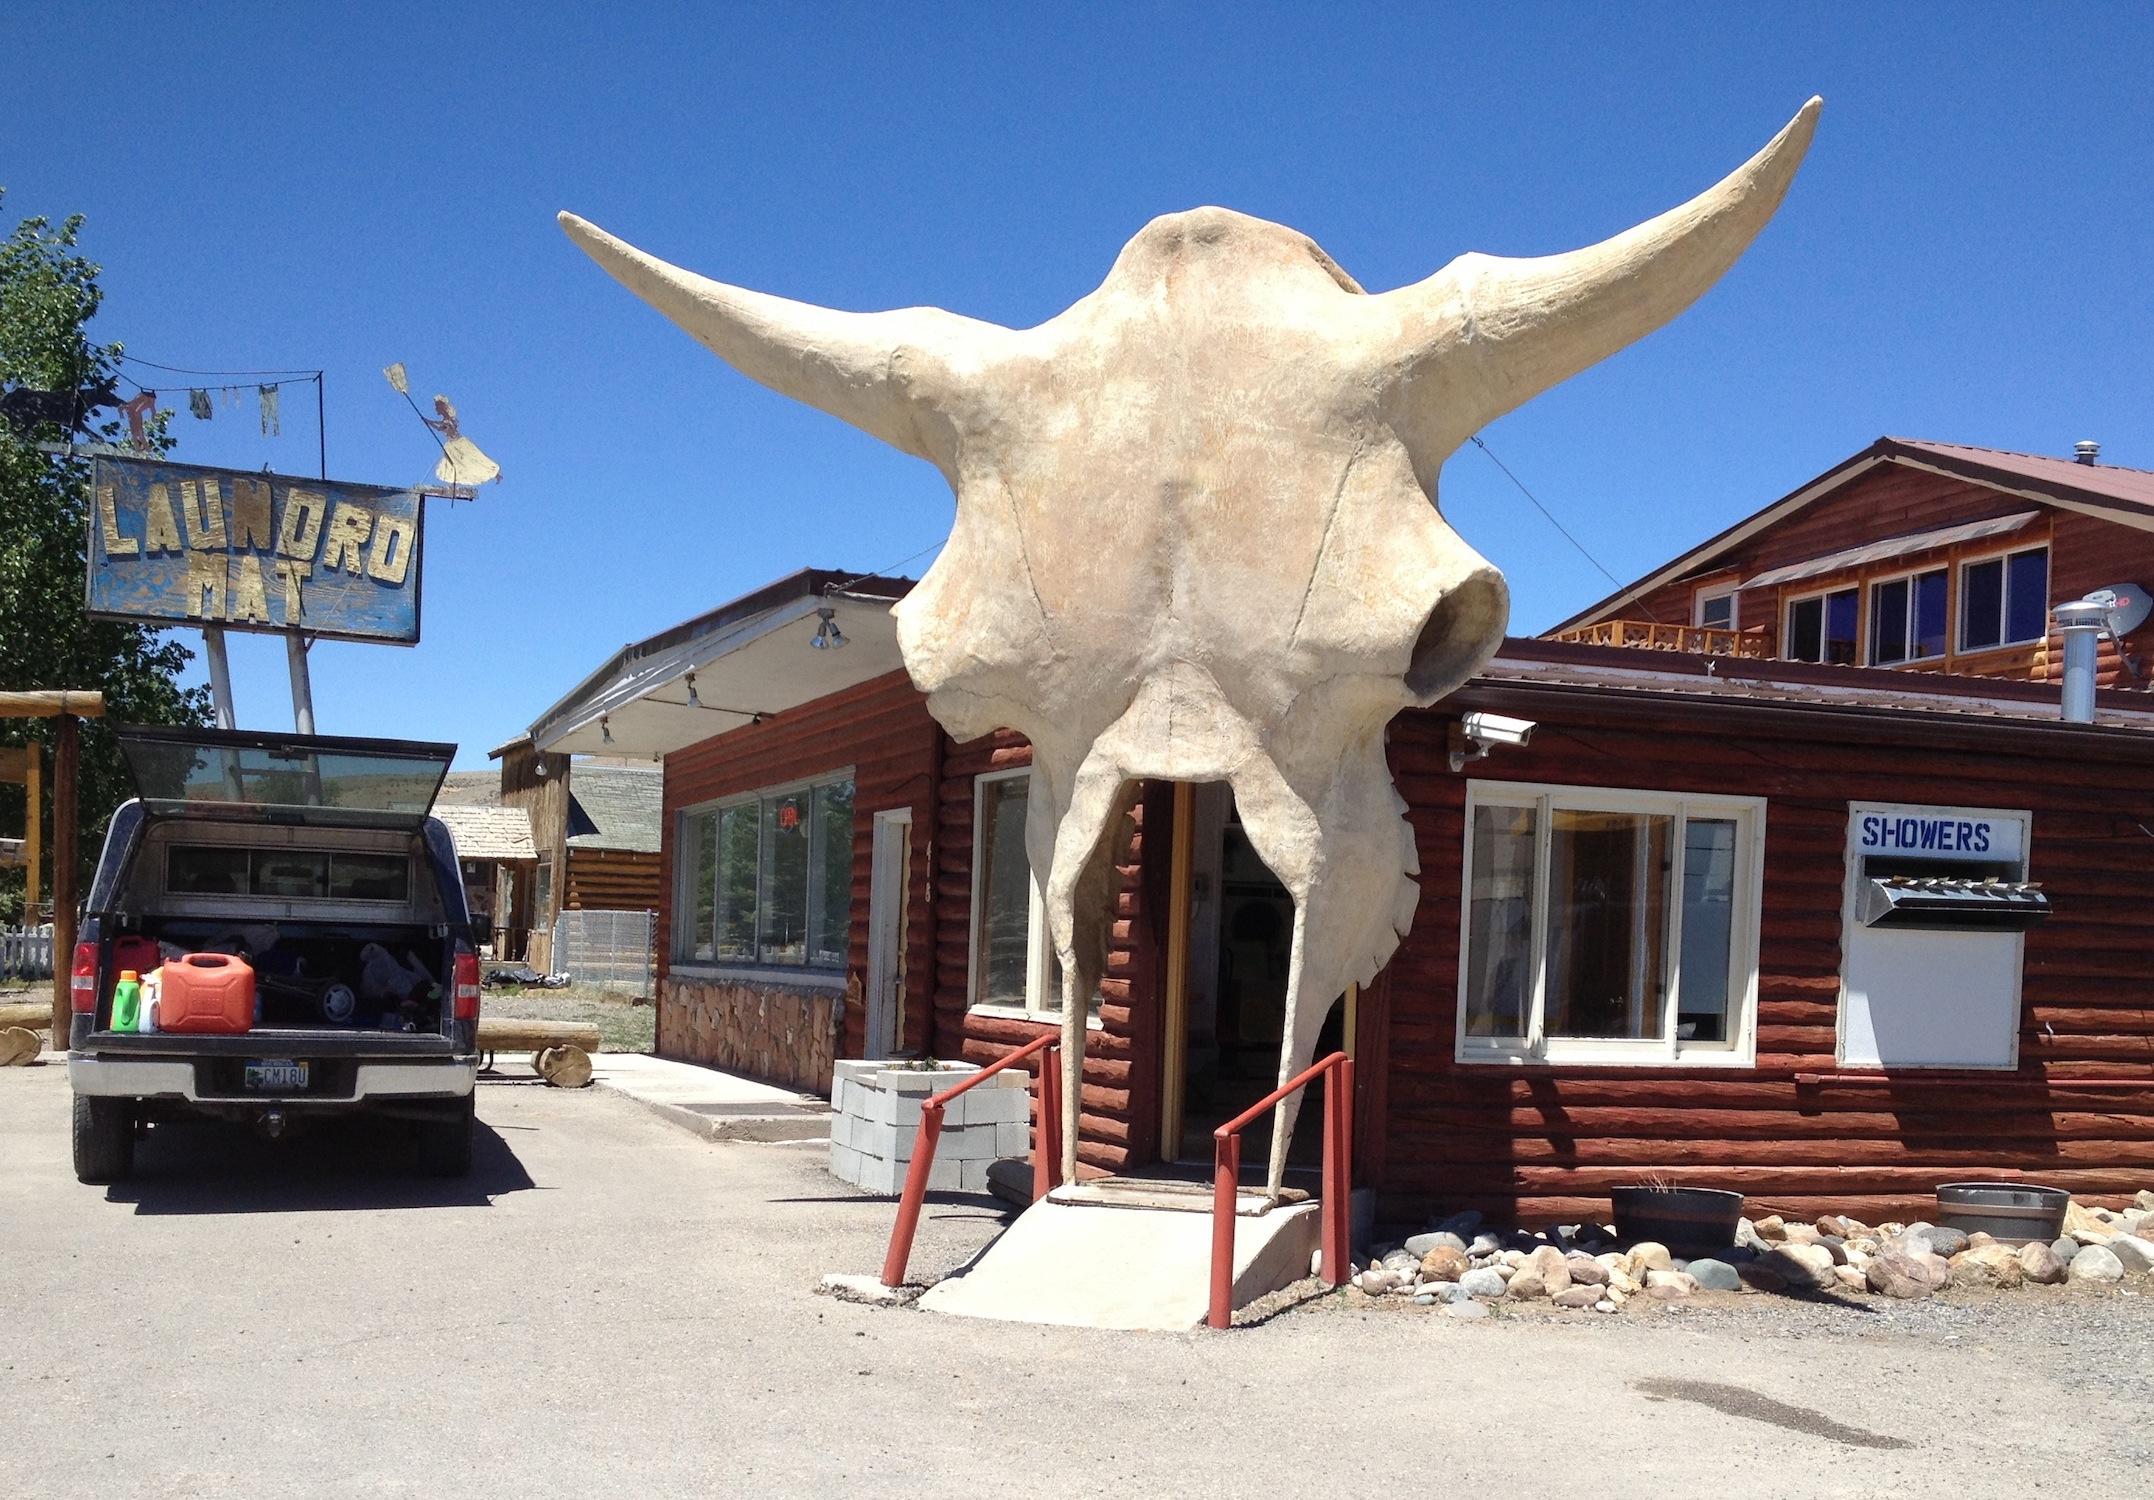 Fun_WyomingLaudrymay.jpg